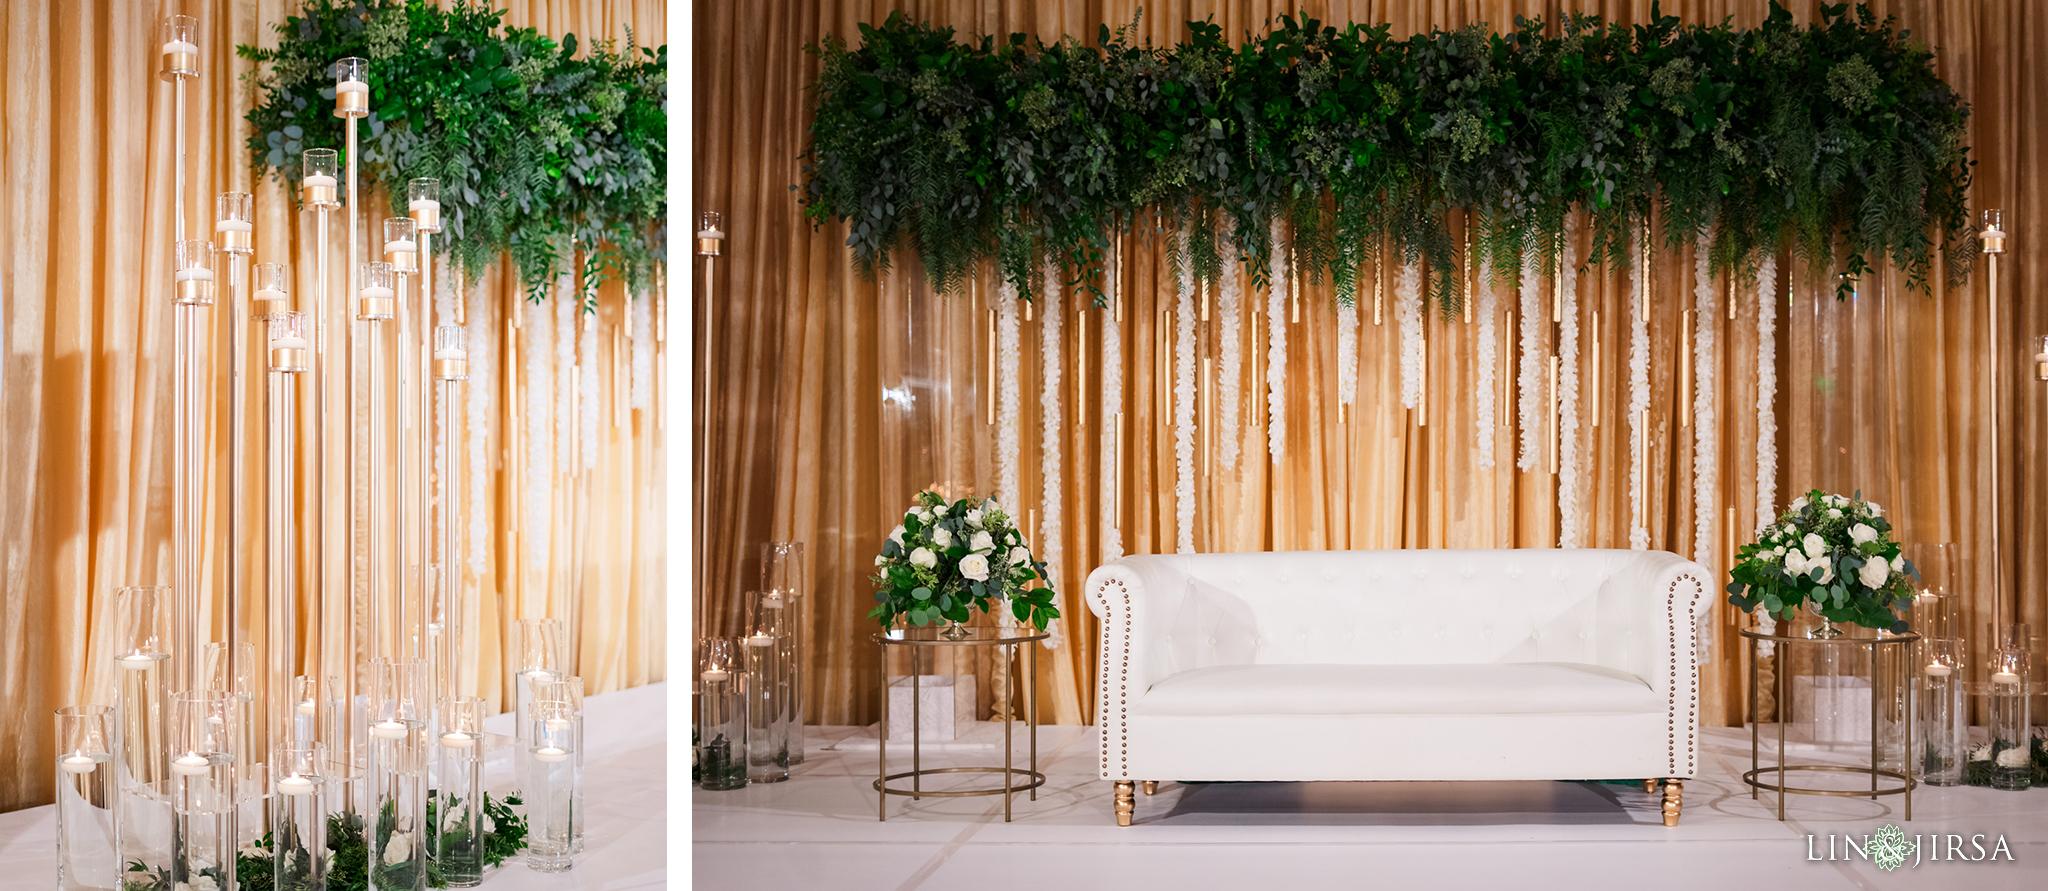 21 Newport Beach Marriott Indian Wedding Photography